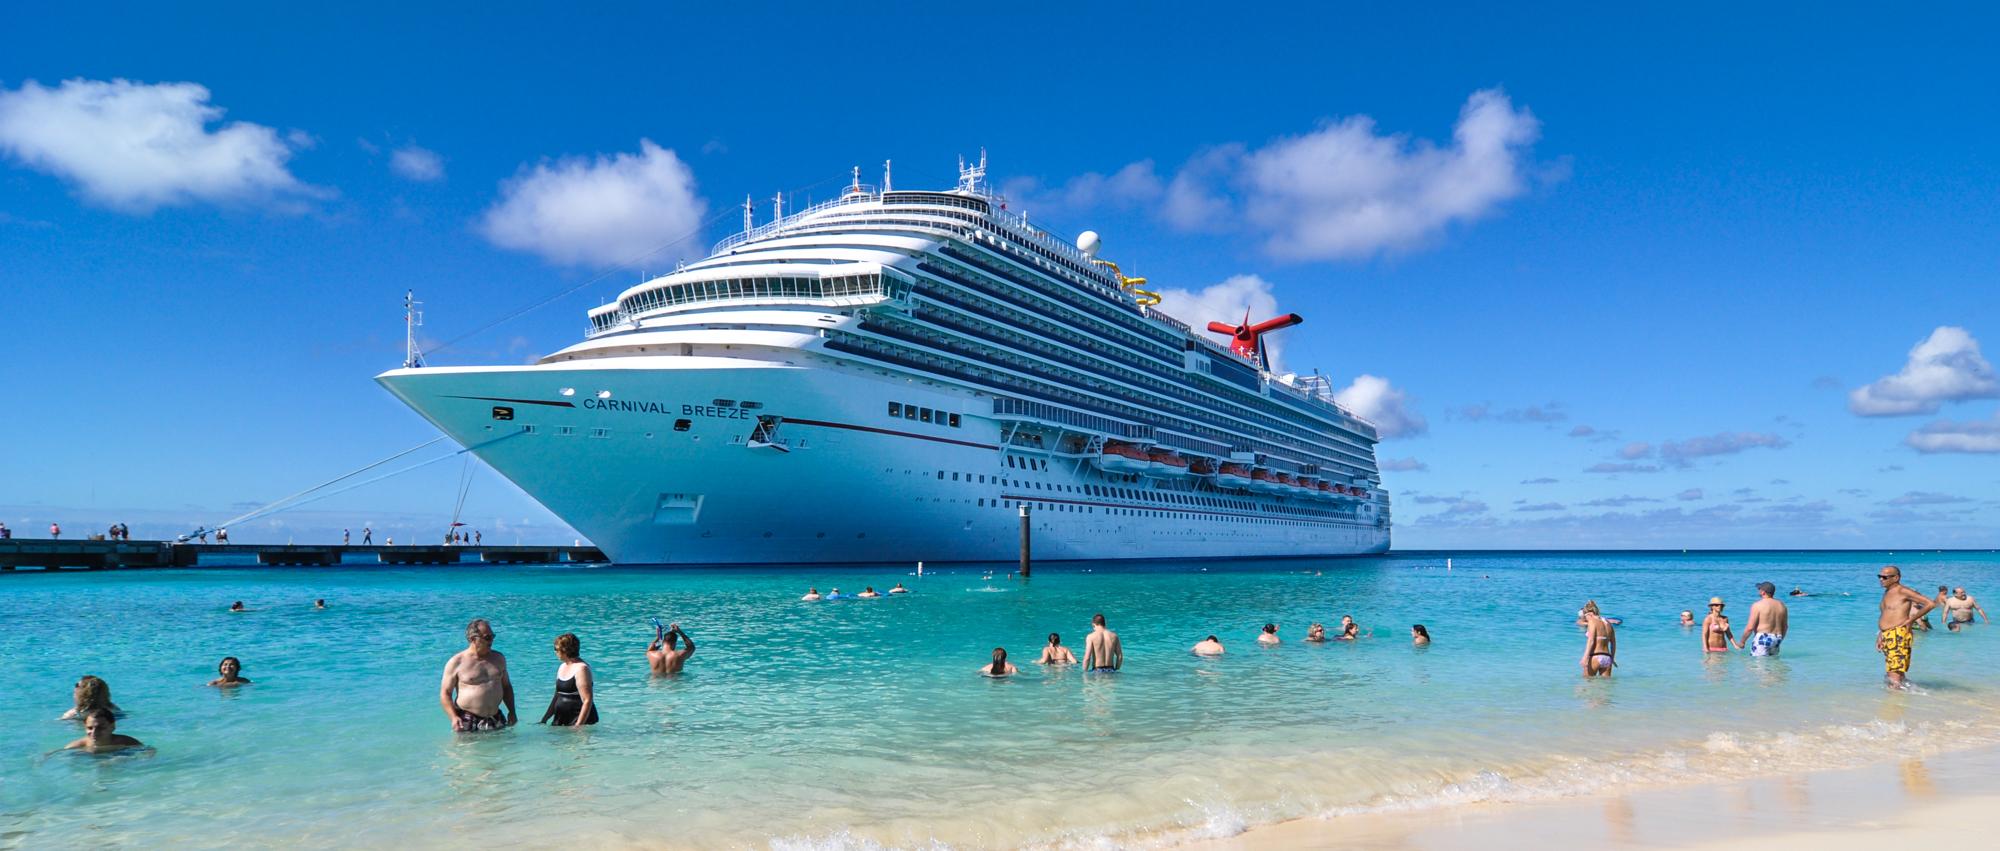 Carnival Cruise Line Carnival Breeze hero 940x400 jpg 2000x851